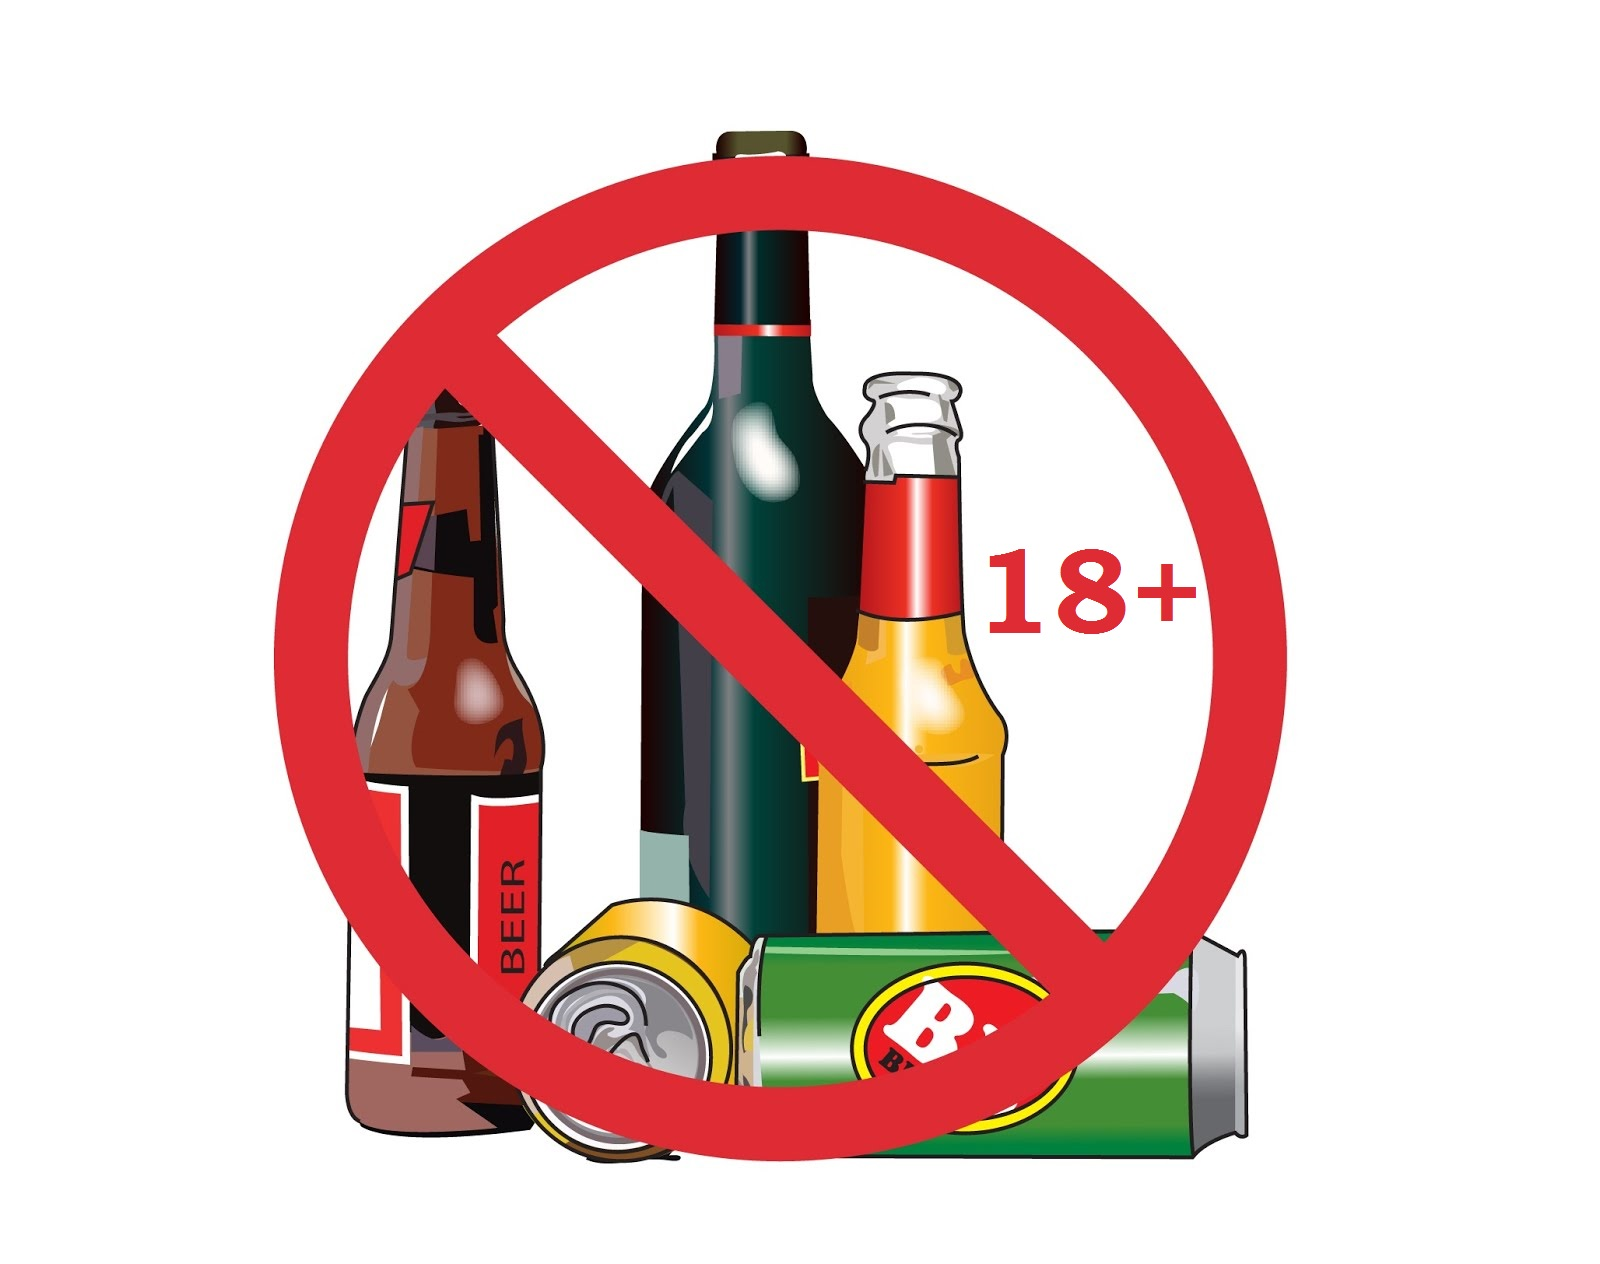 Продажа пива несовершеннолетним штраф 2019